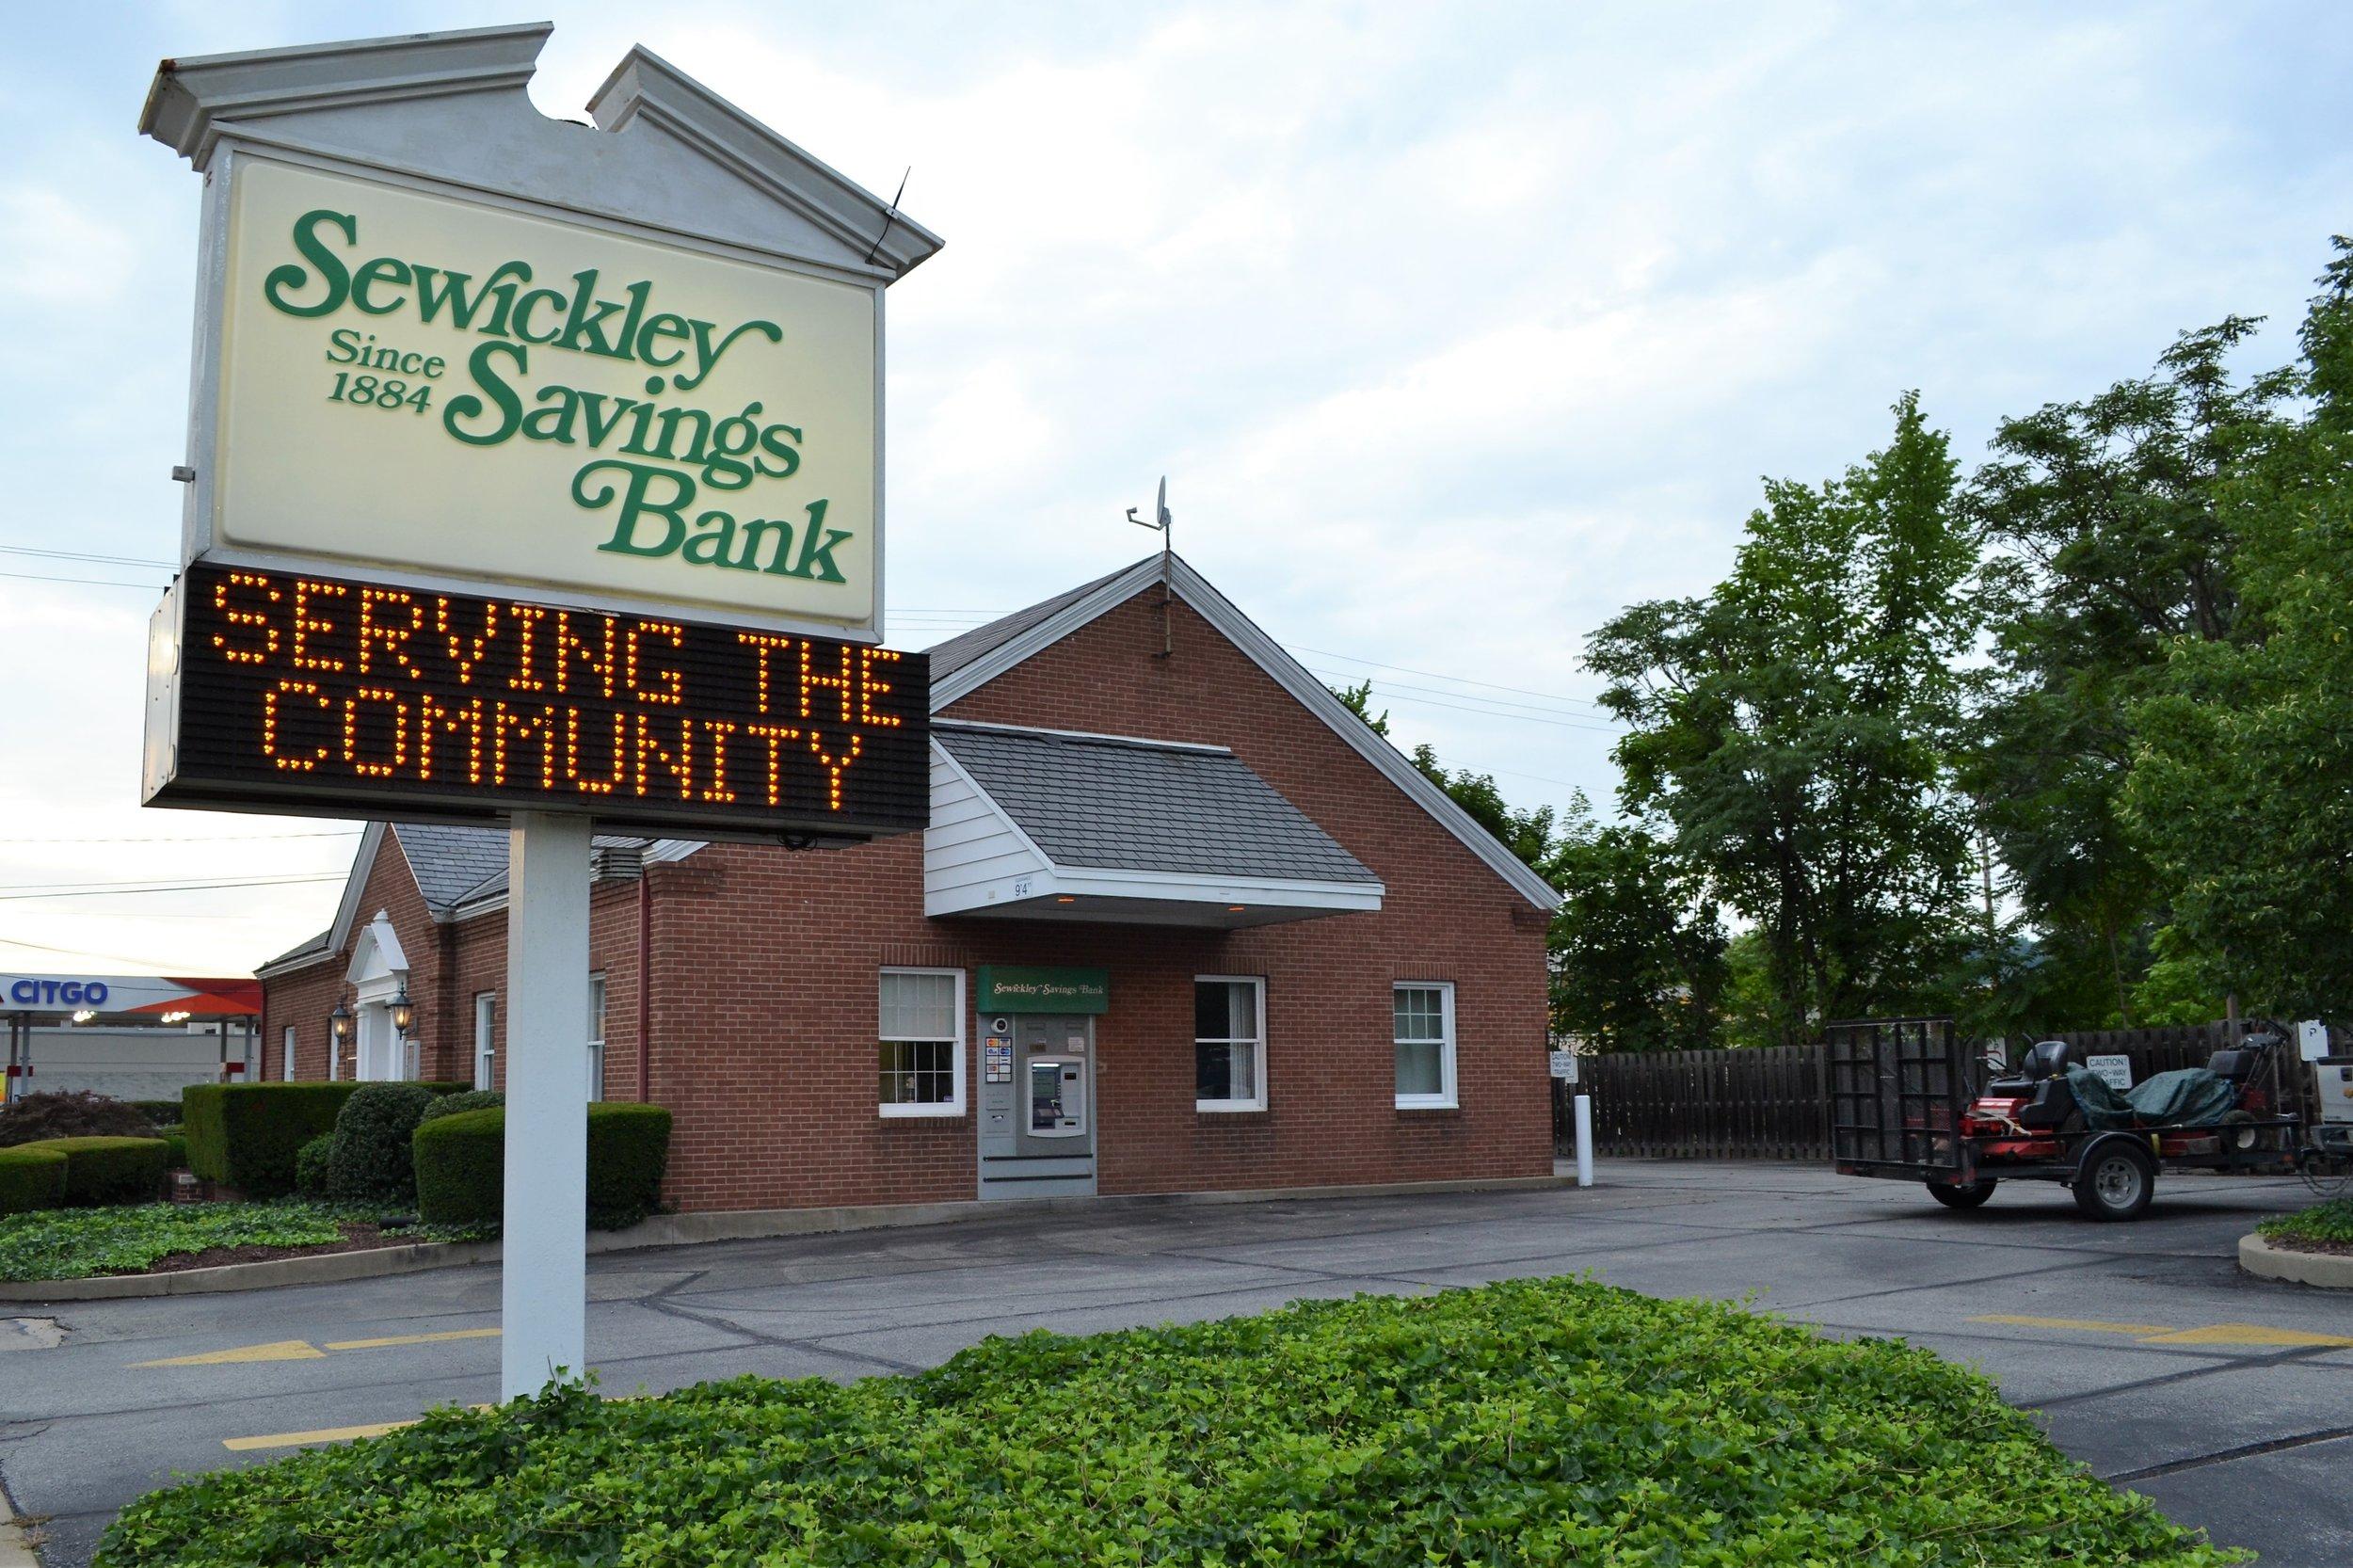 Sewickley Savings Bank - 901 4th Ave, (412) 264-4940